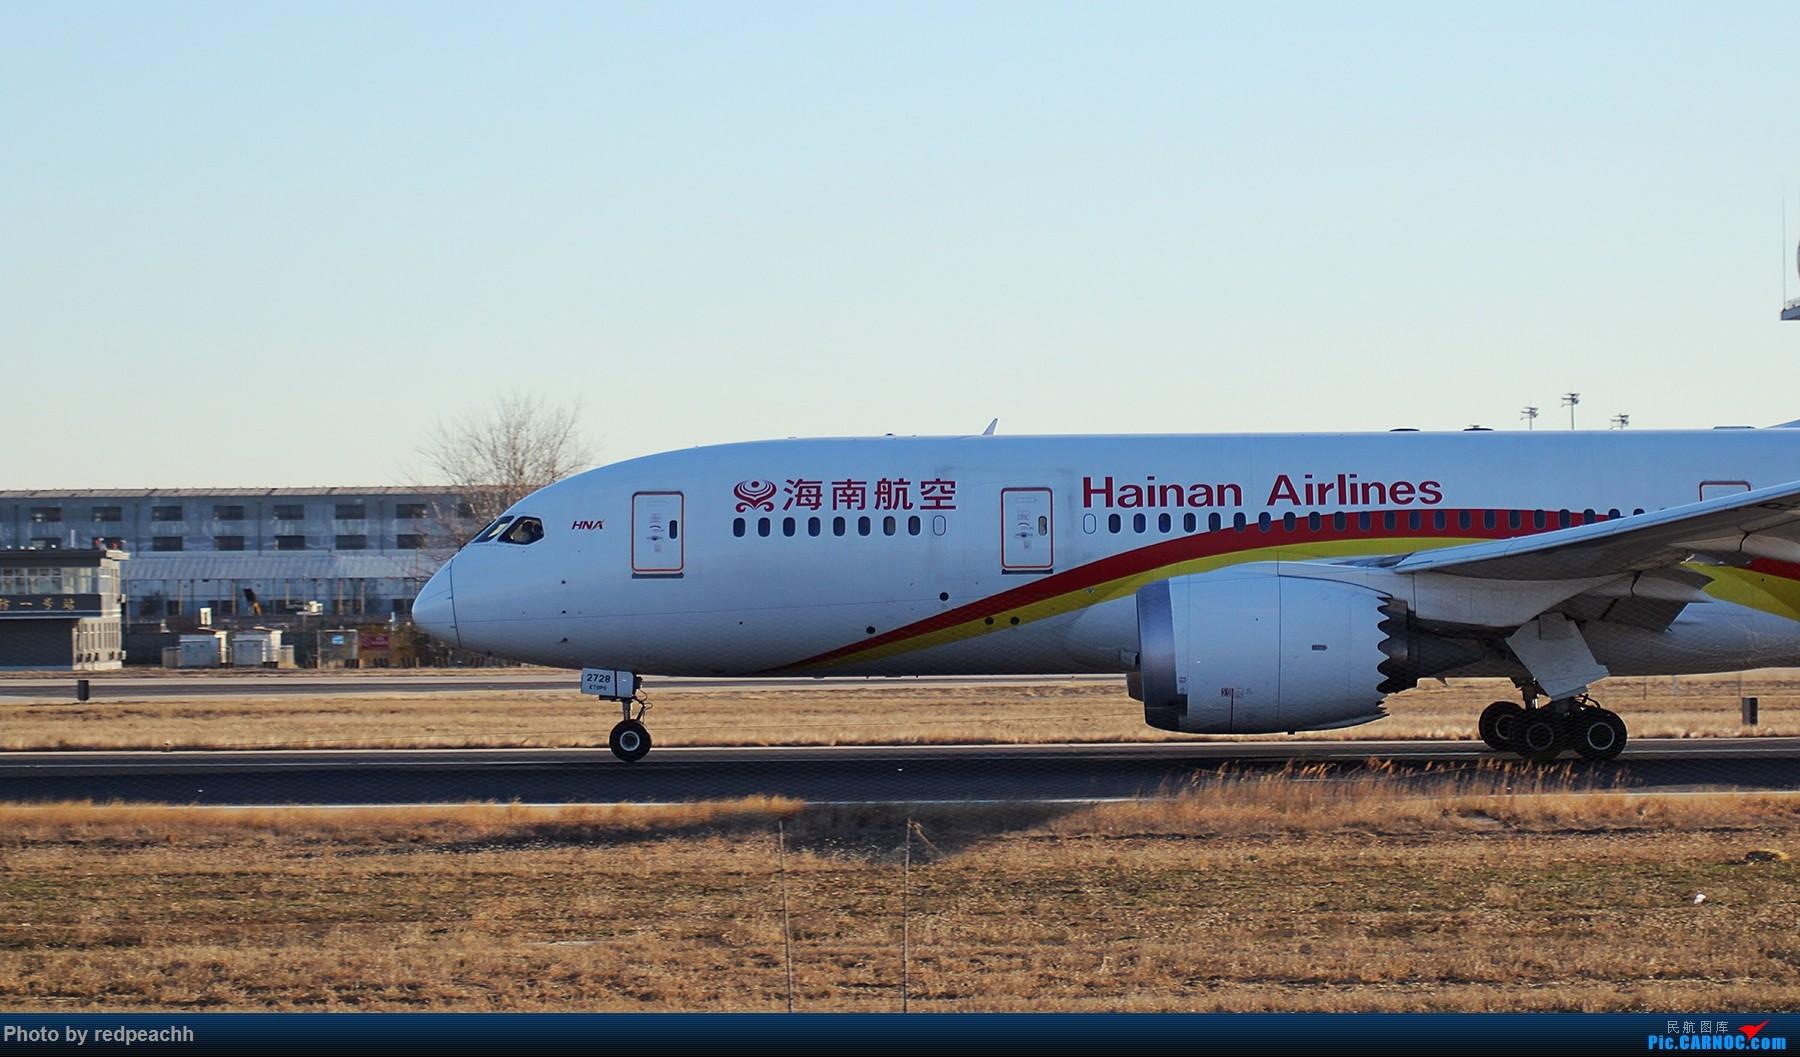 Re:[原创](持续更新)河北人为拍机而首都机场2日游(杨二营、八卦台)虽均为常规货但值得纪念(36L) BOEING 787-8 B-2728 中国北京首都国际机场